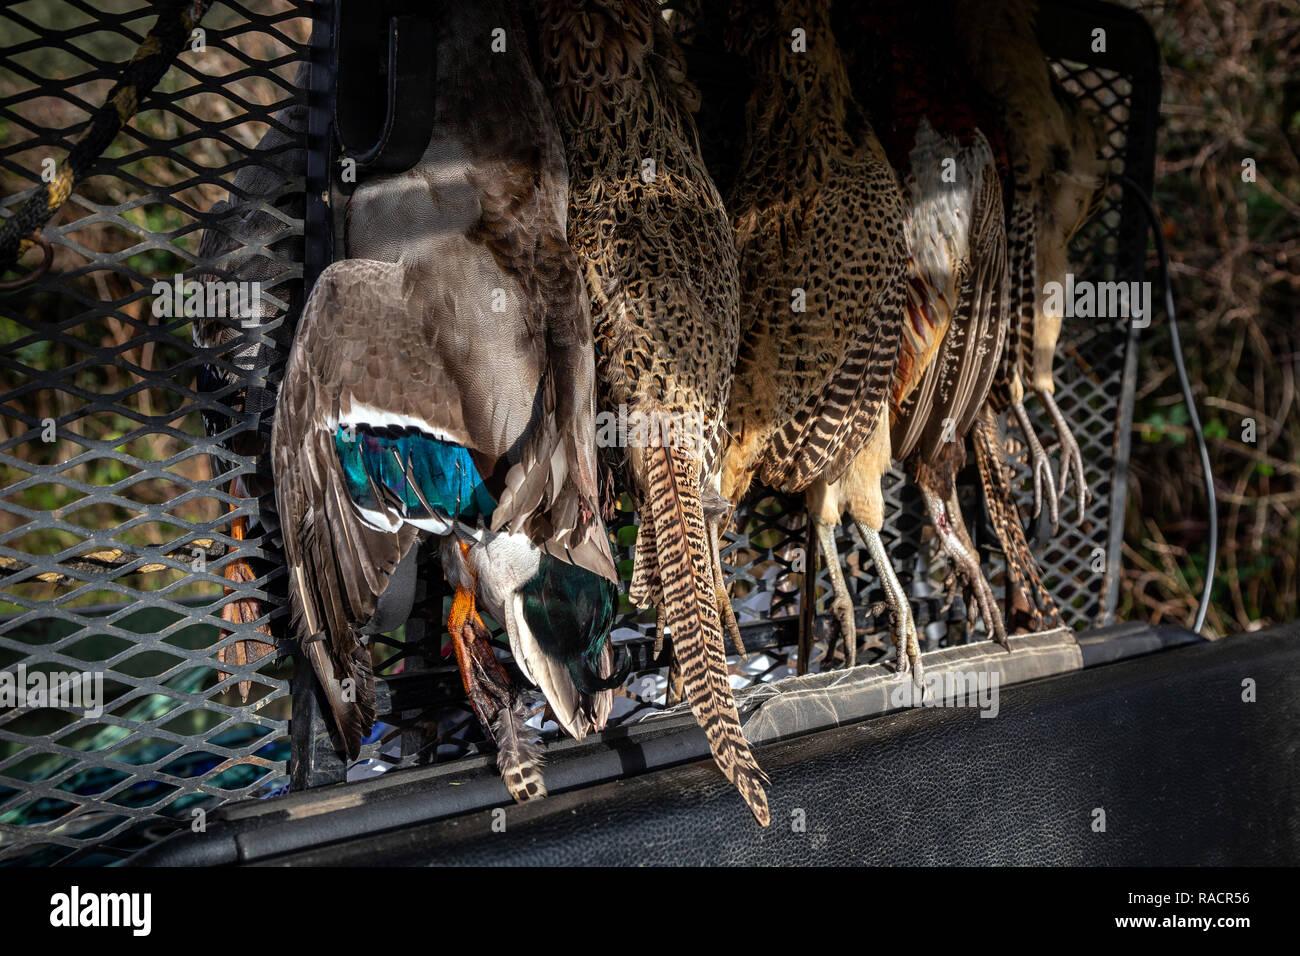 Gamebird hanging in back of Gator, Gate, Animals Hunting, Duck - Bird, Duck Meat, Pheasant - Bird, Bird, Dead Animal, England, Game ,Rural Scene, Side - Stock Image